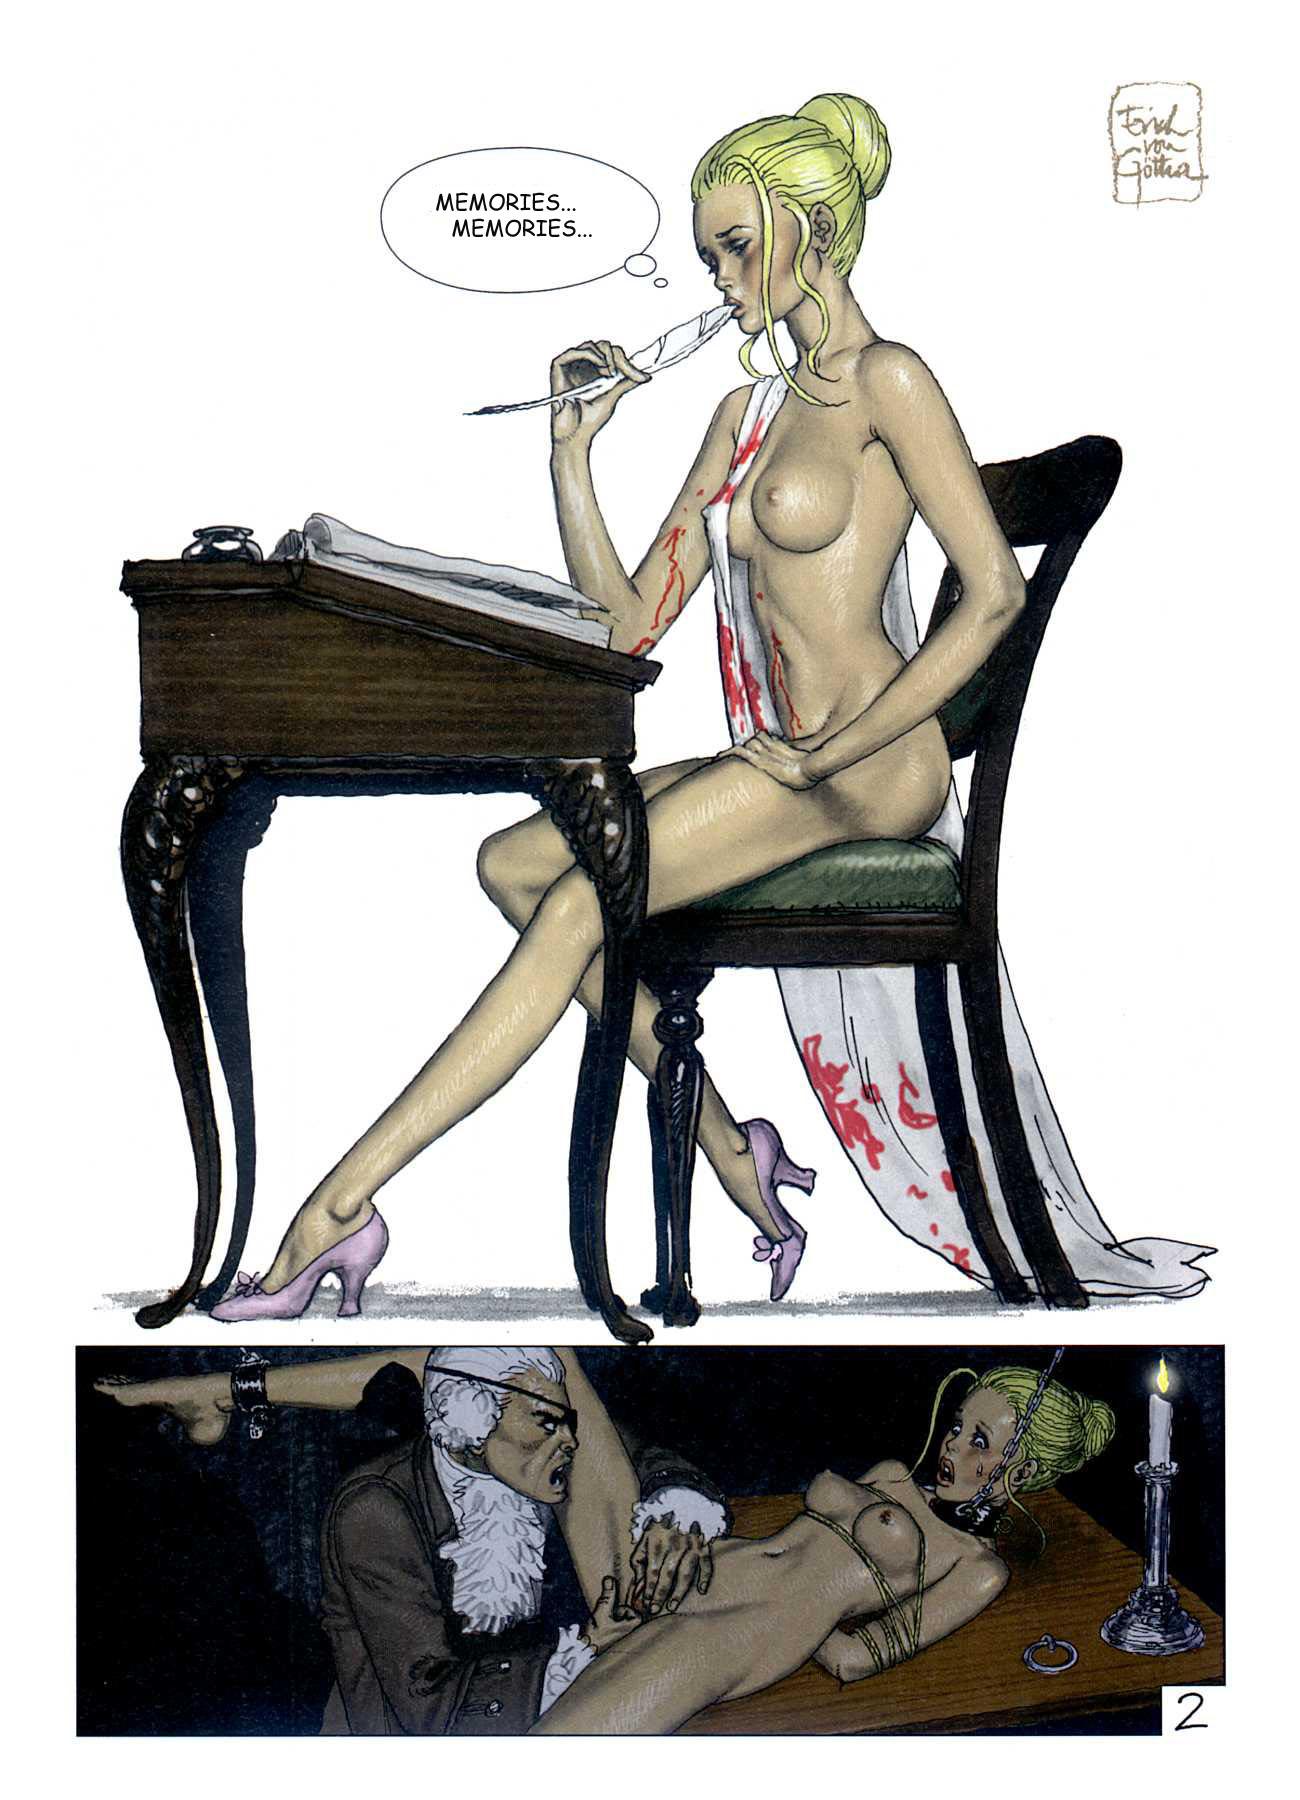 After Party Janice Sketch Comic Porno erich von gotha comics | free porn comics online